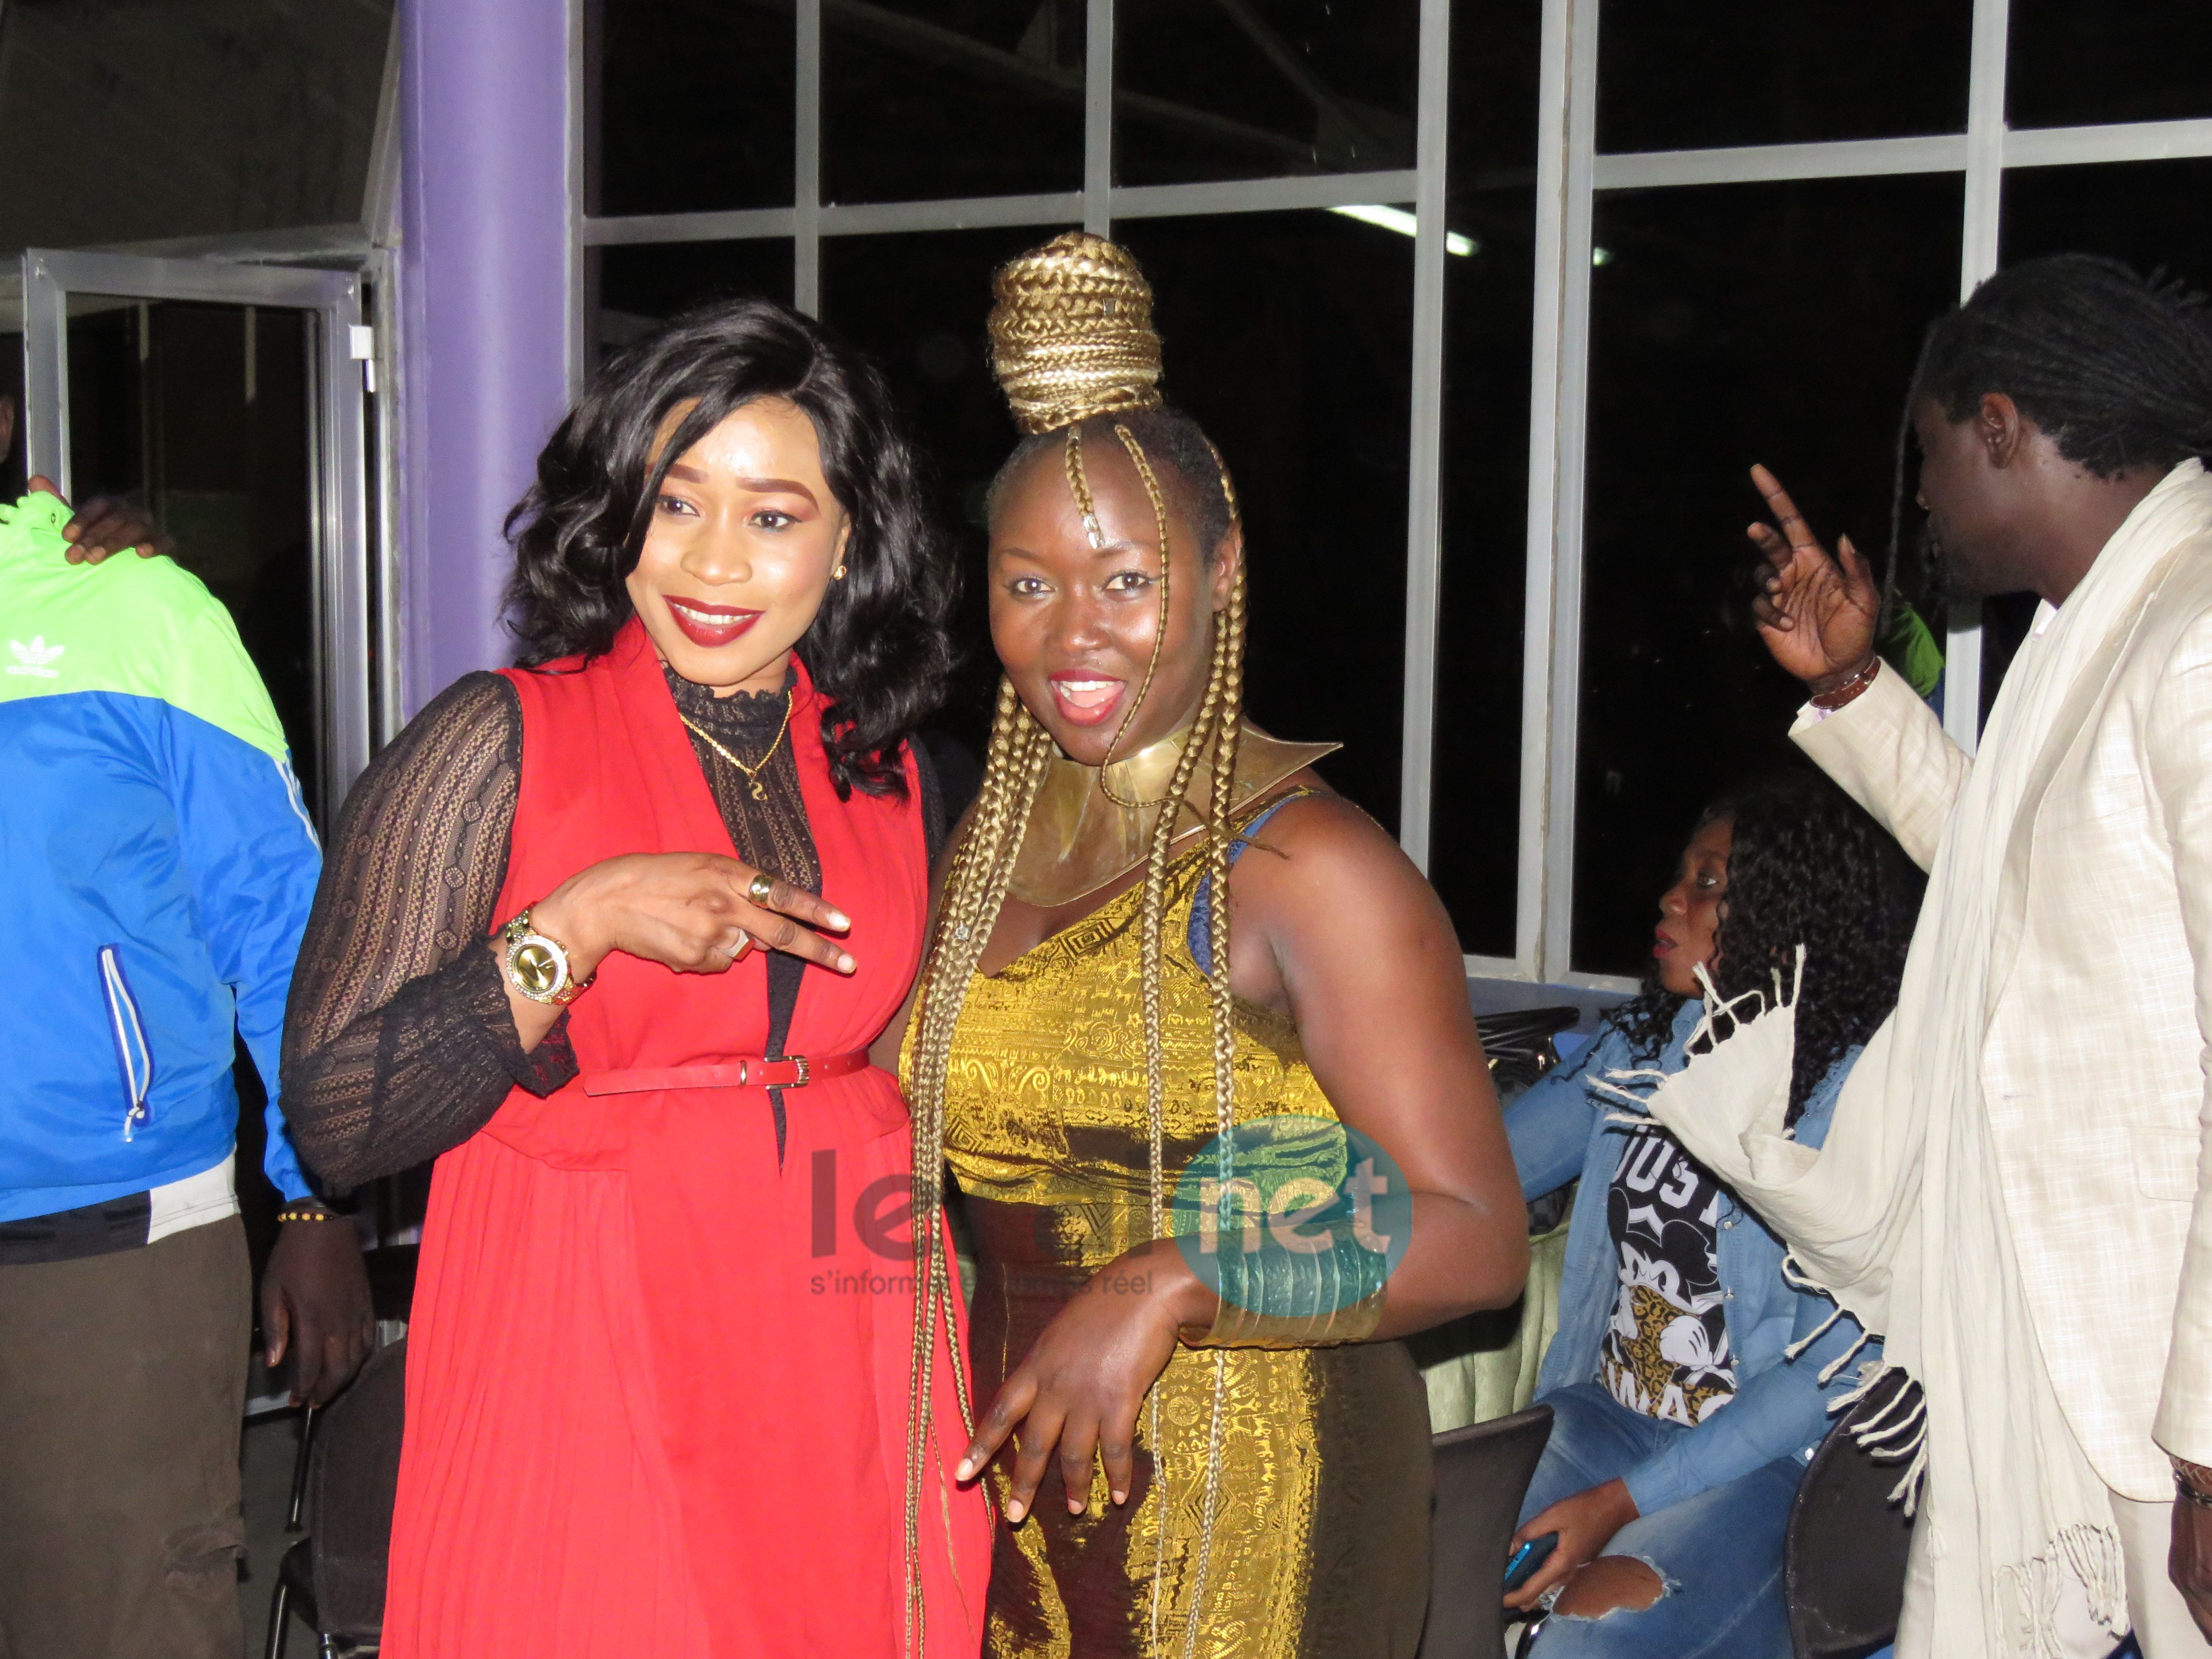 Aïda Samb, Yoro Ndiaye et Maréma Fall en toute complicité